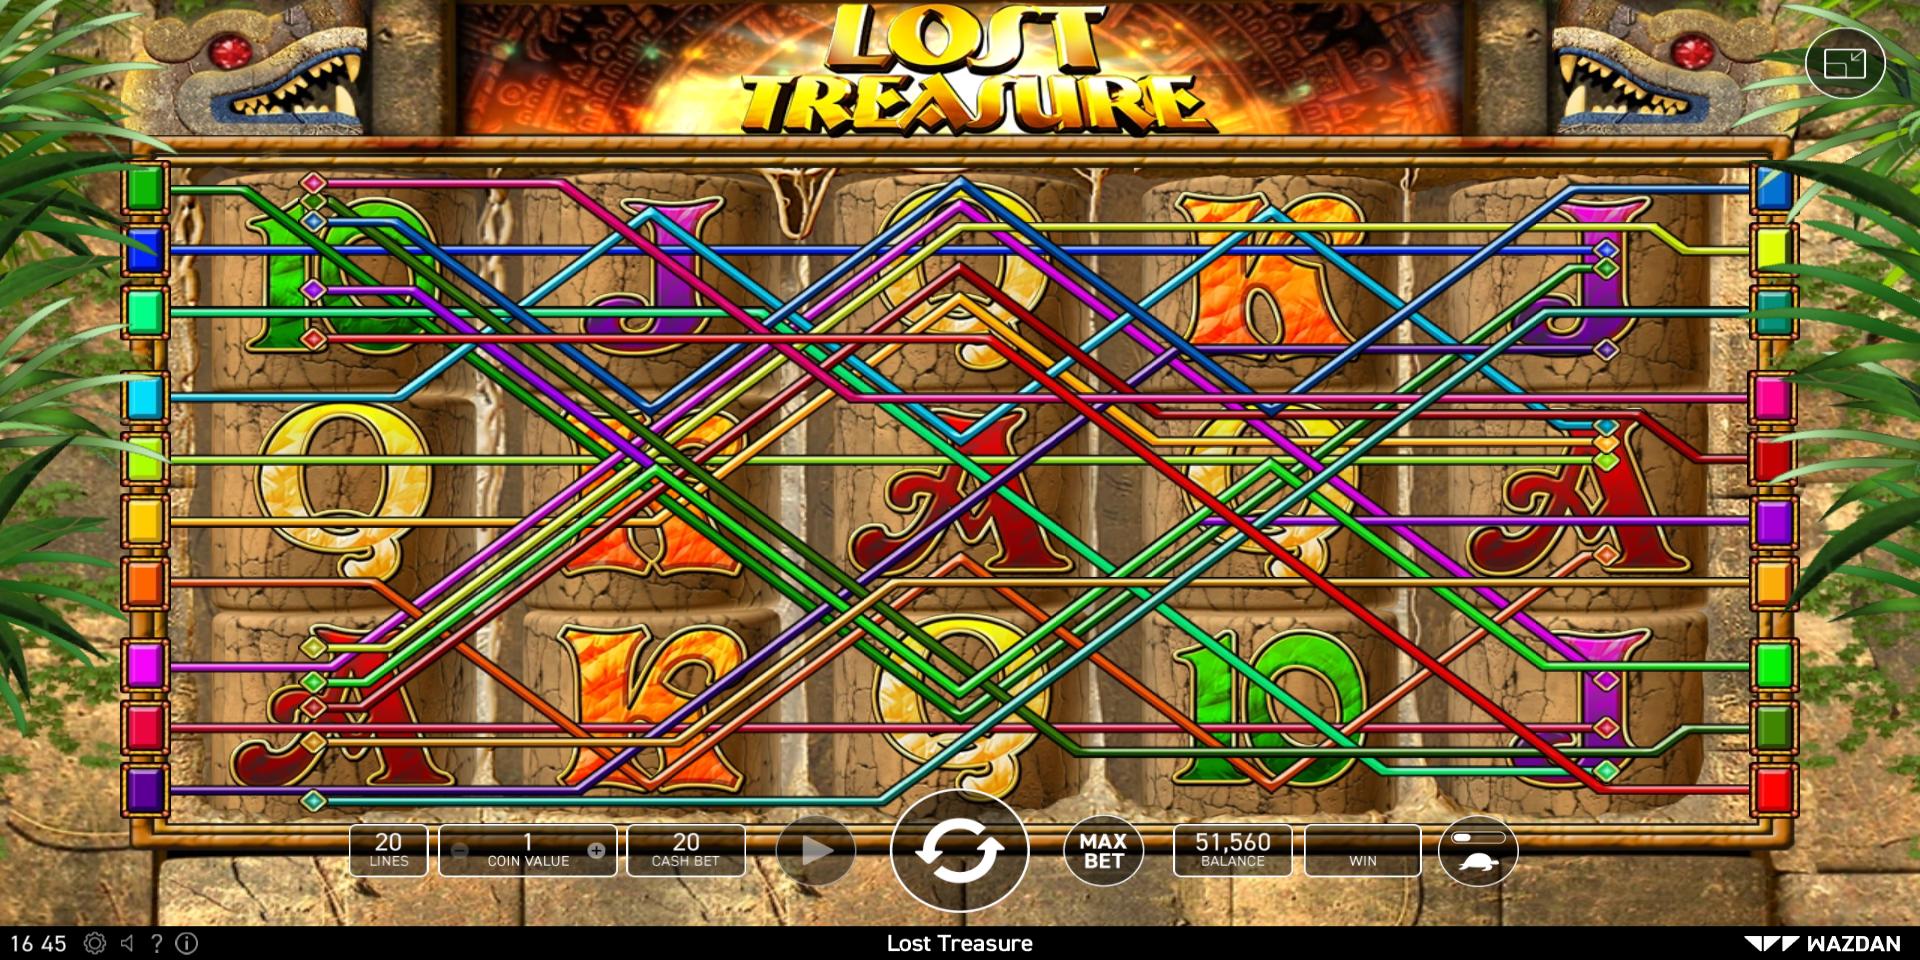 Slots Lost Treasure